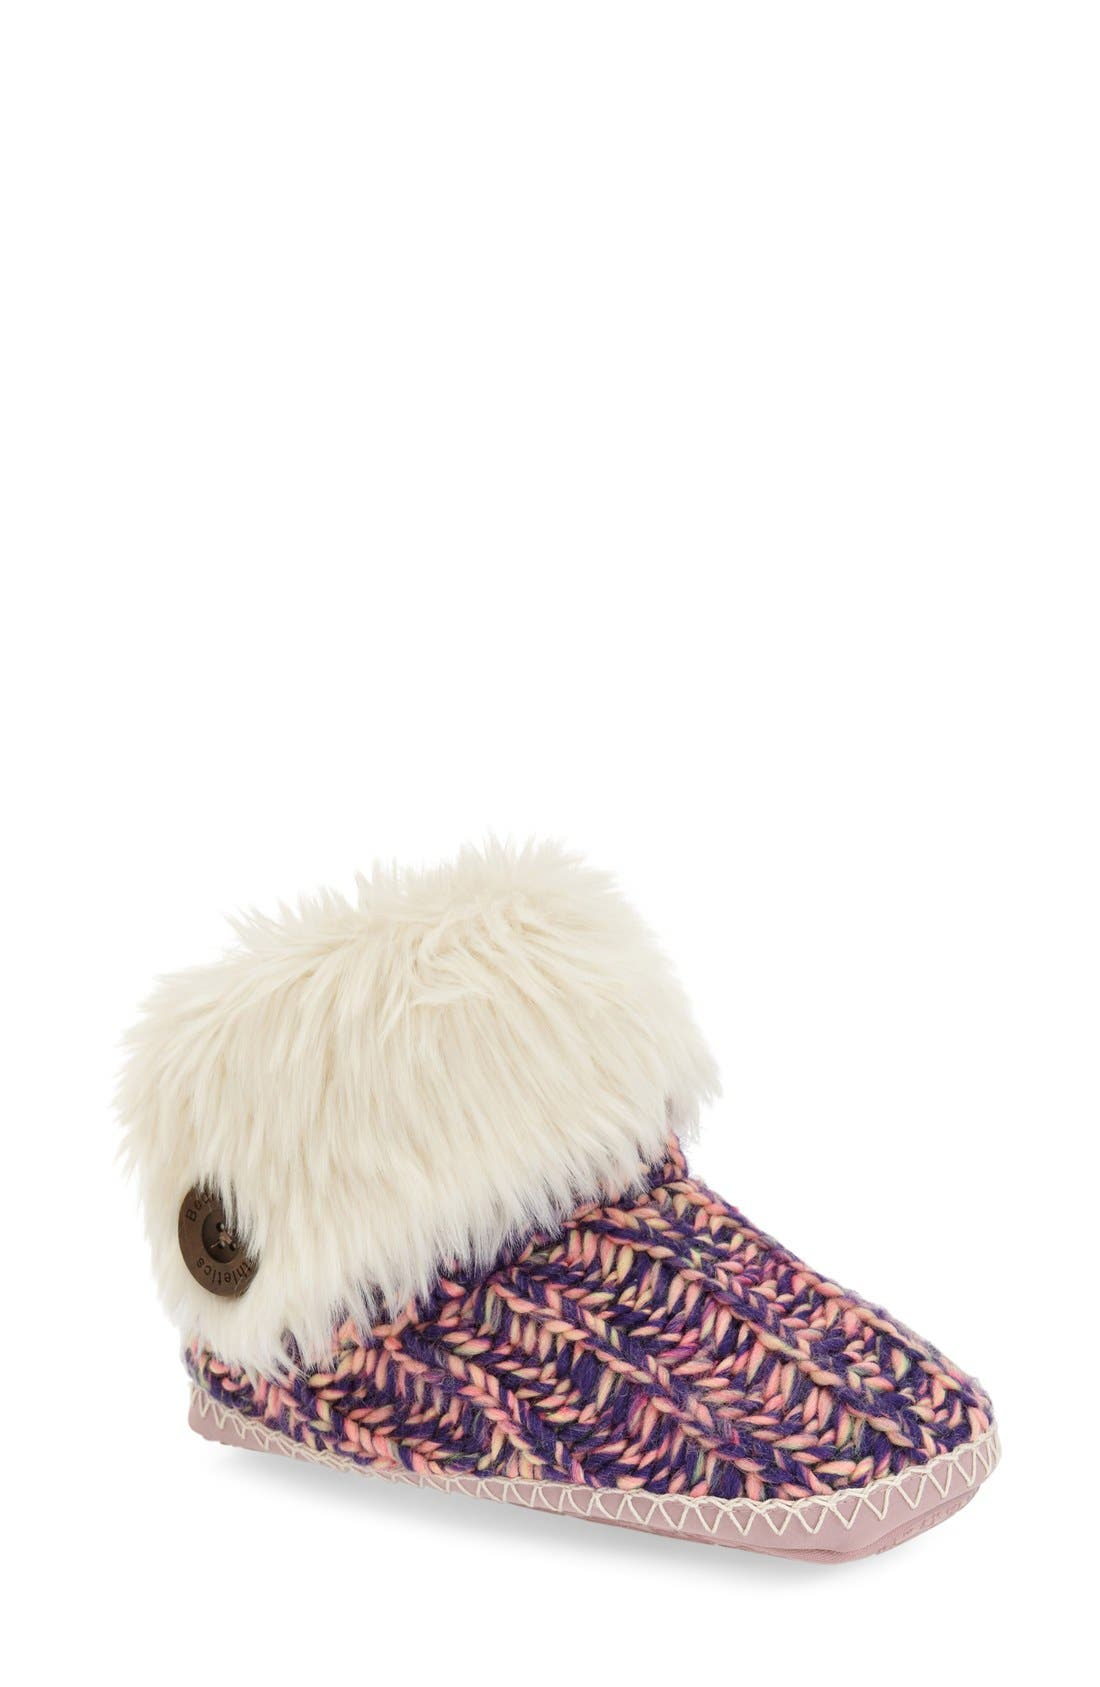 Alternate Image 1 Selected - Bedroom Athletics 'Toni' Faux Fur Knit Slipper Bootie (Women)